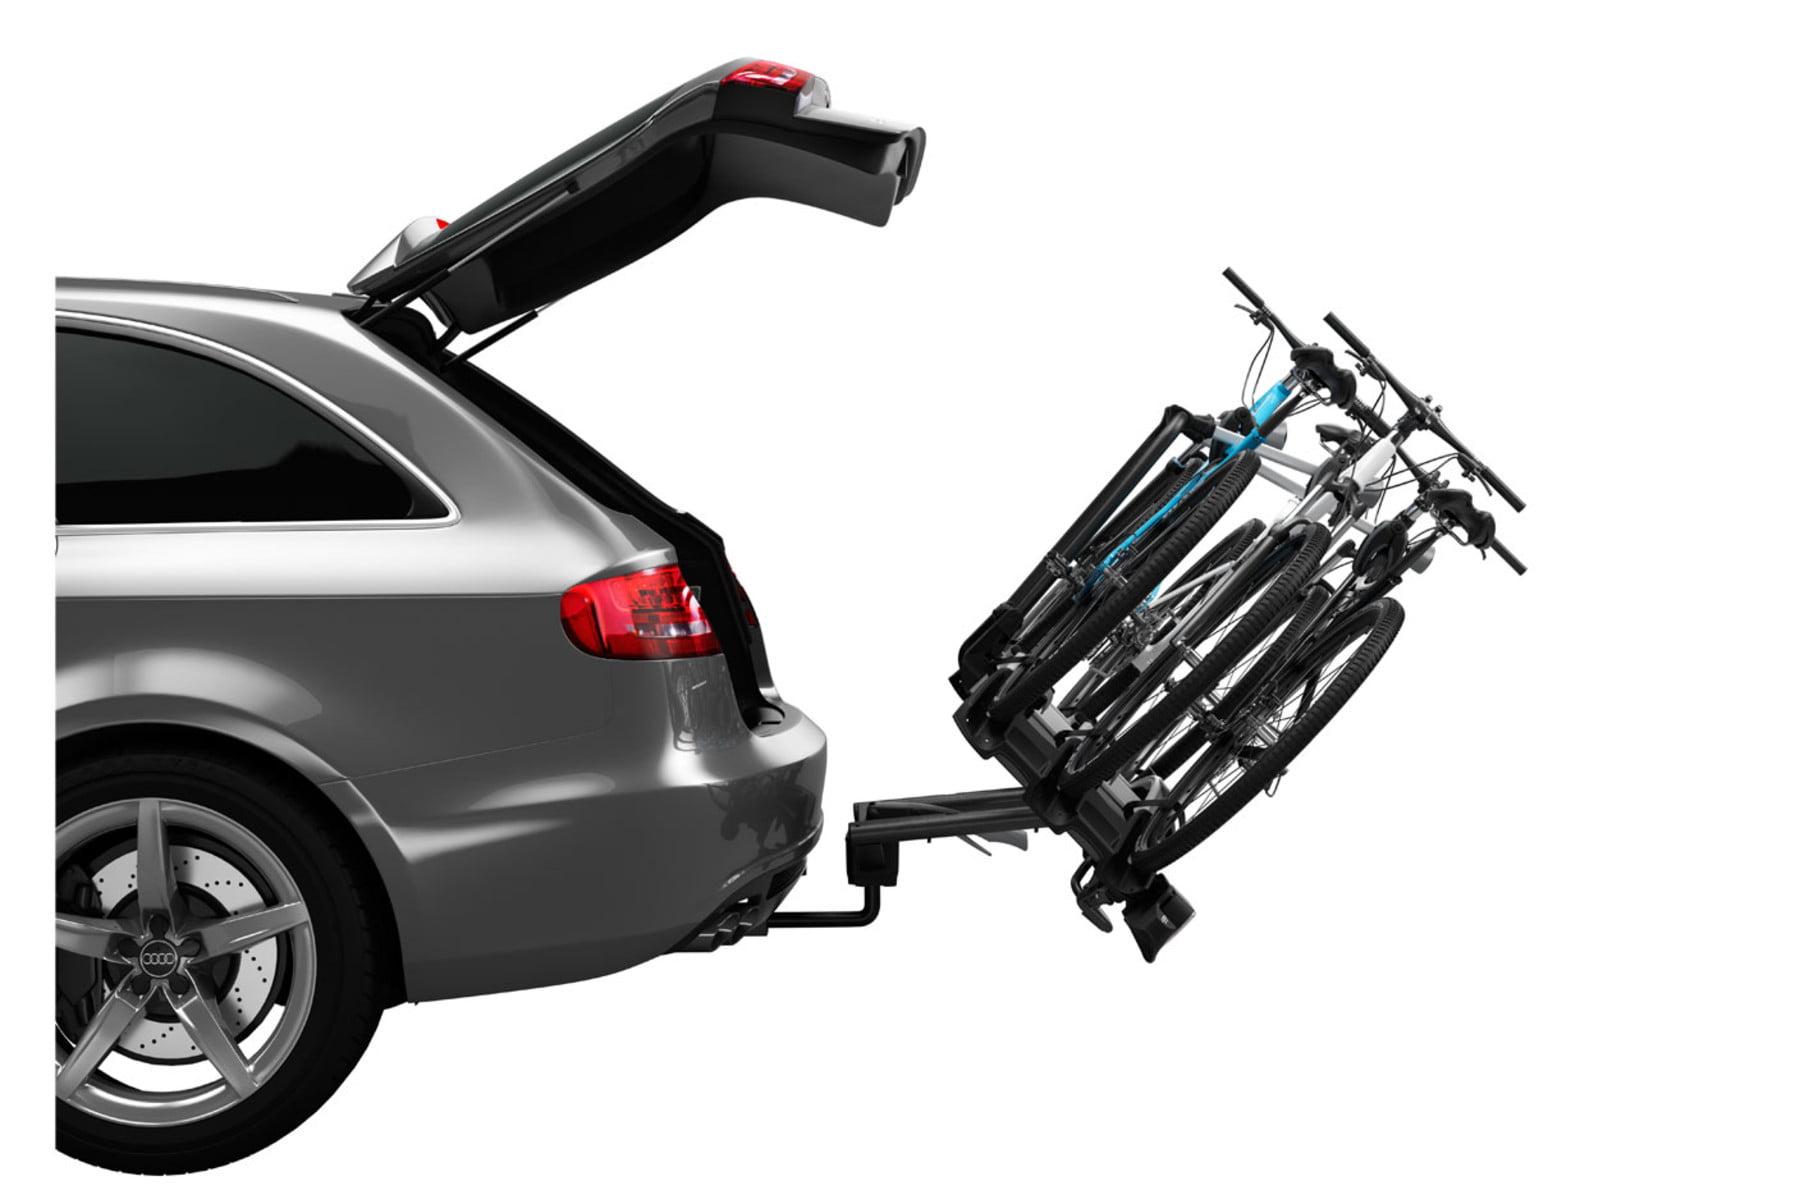 Suport biciclete Thule VeloCompact 927 cu prindere pe carligul de remorcare 5